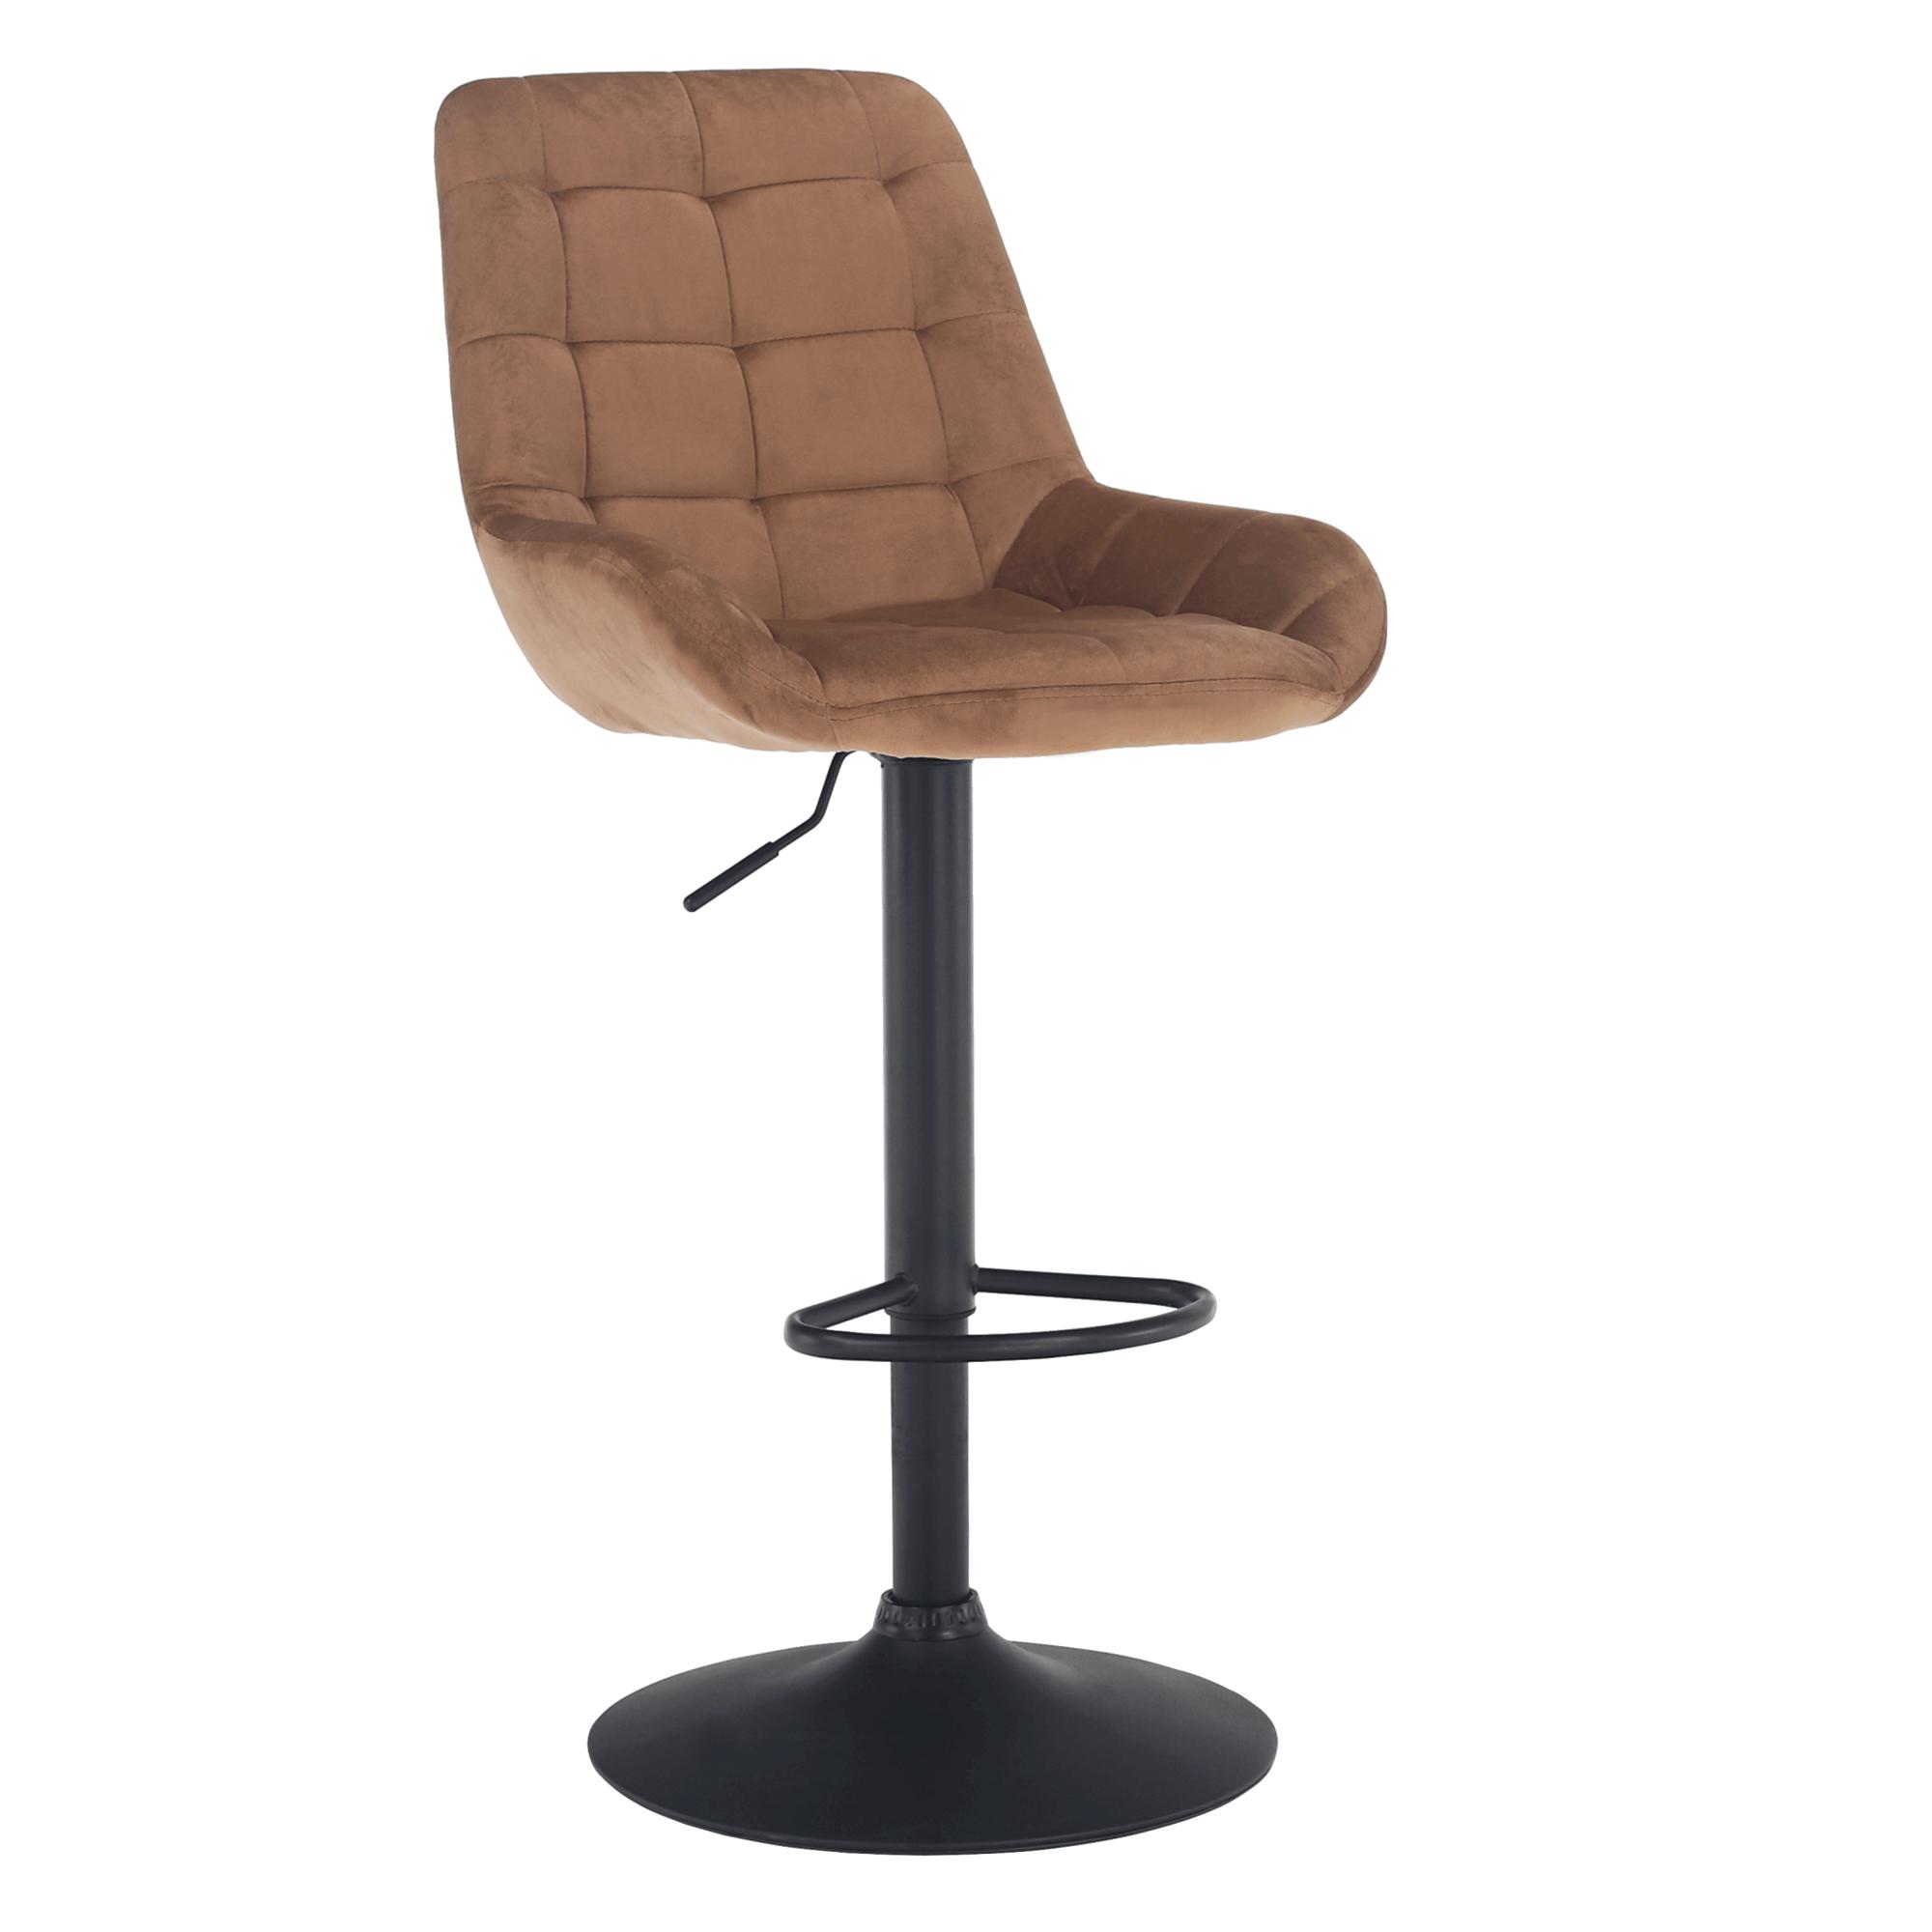 Barová stolička, hnedá Velvet látka, CHIRO NEW